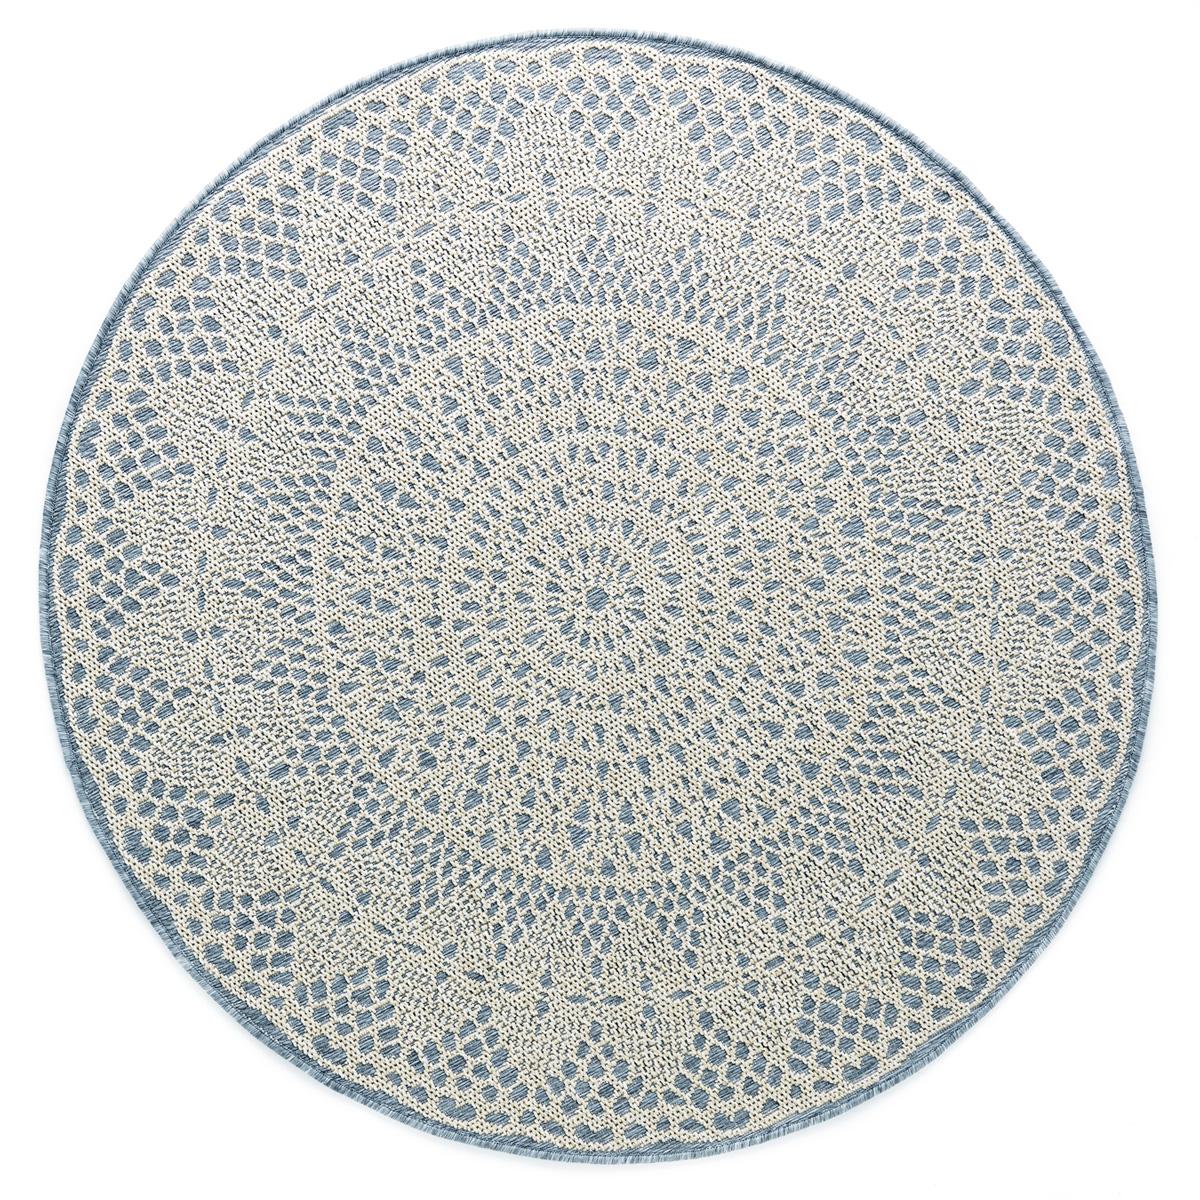 Tapis rond crochet gris 200x200